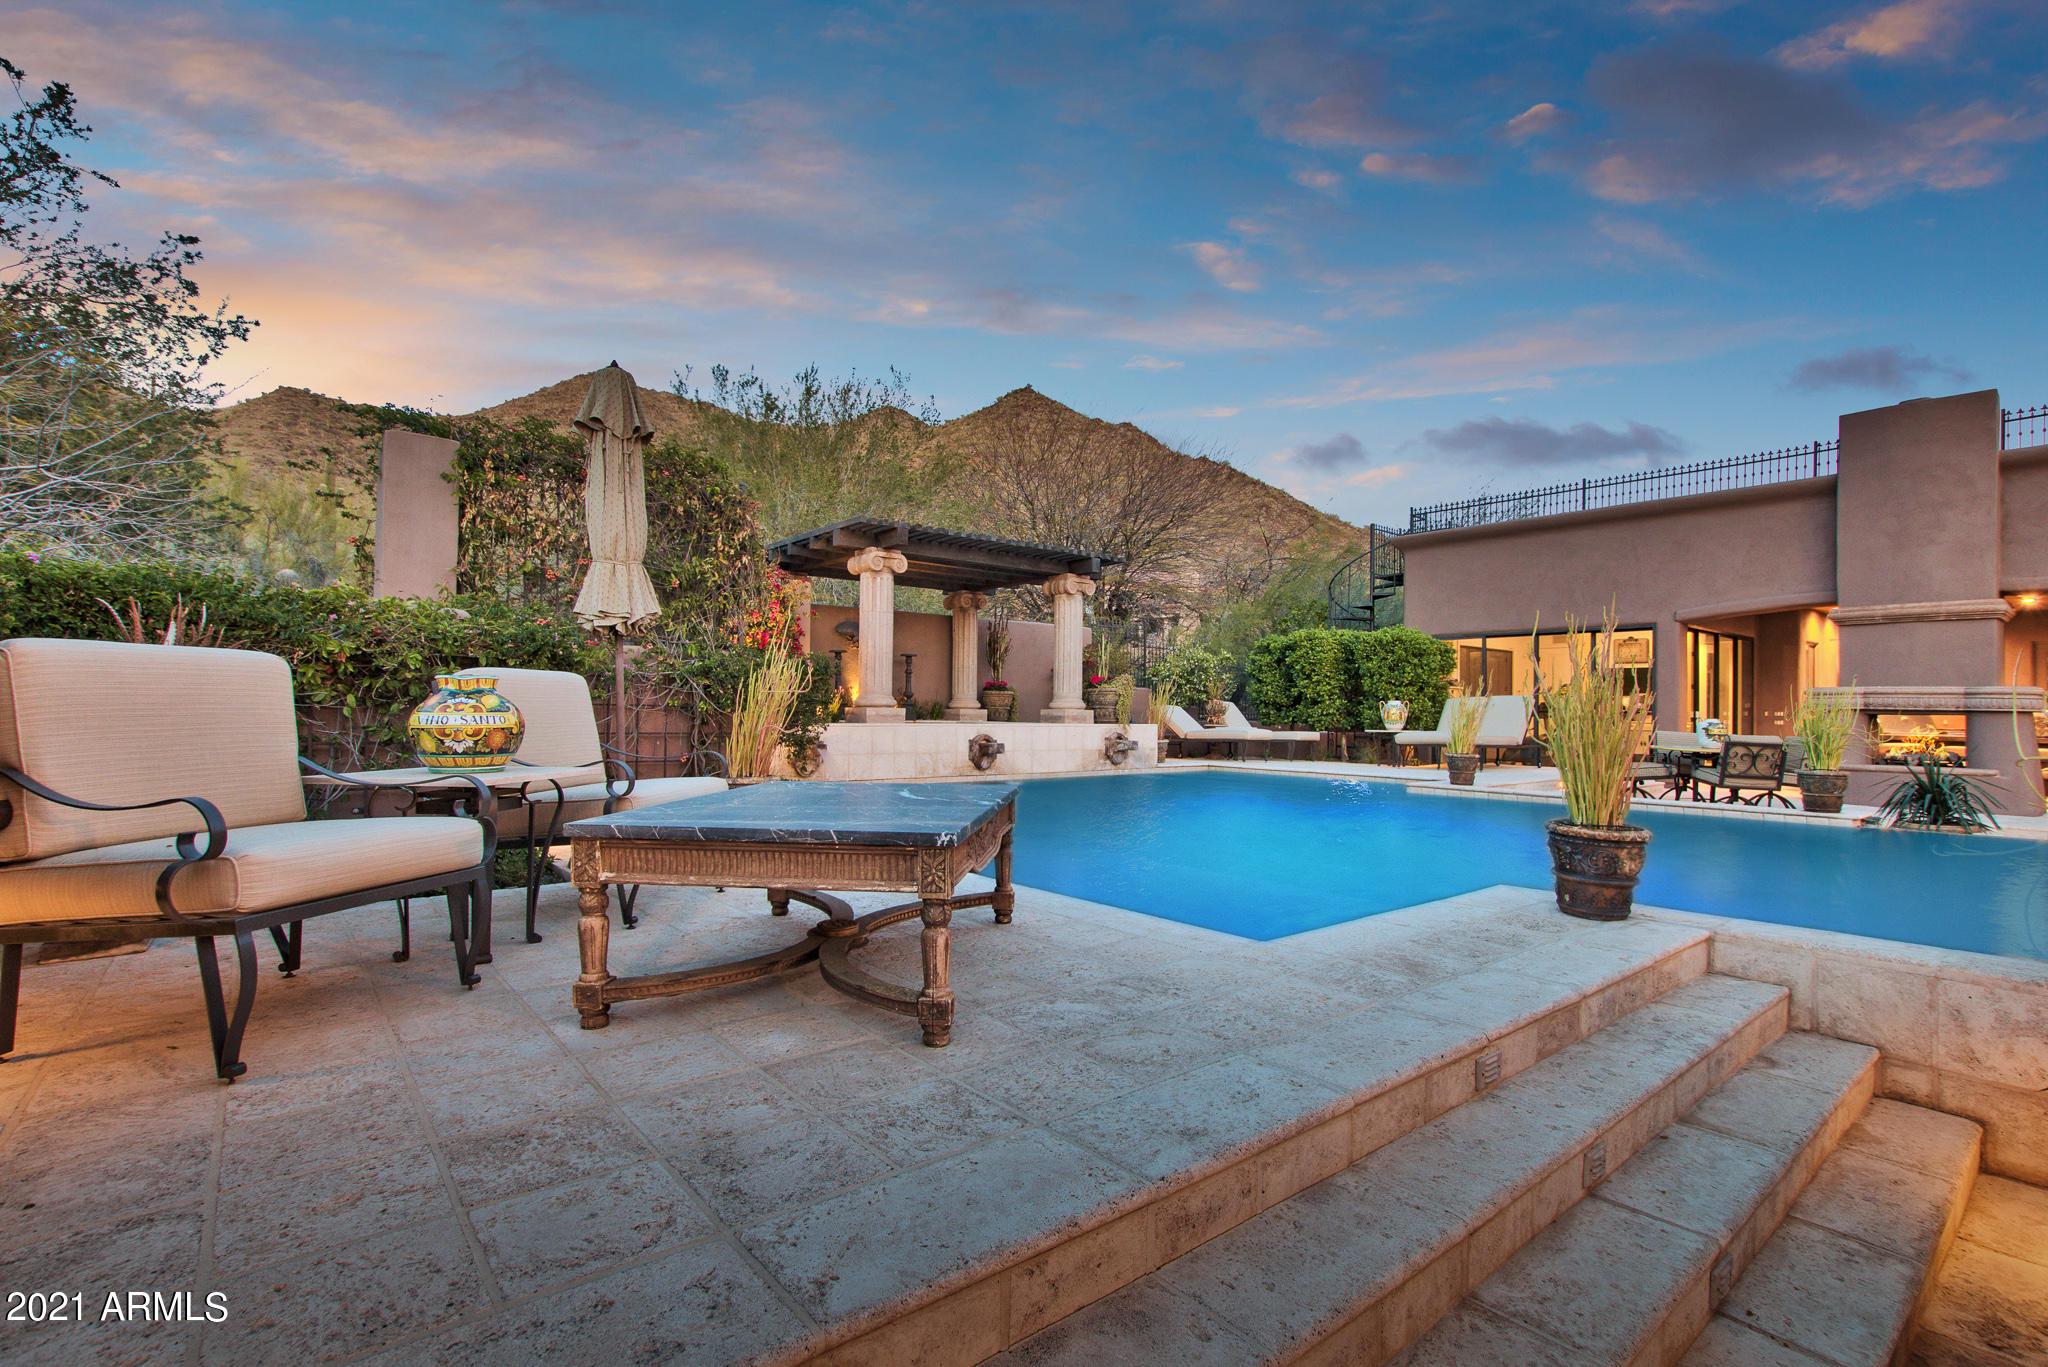 16469 113TH Way, Scottsdale, Arizona 85255, 4 Bedrooms Bedrooms, ,4.5 BathroomsBathrooms,Residential,For Sale,113TH,6211204